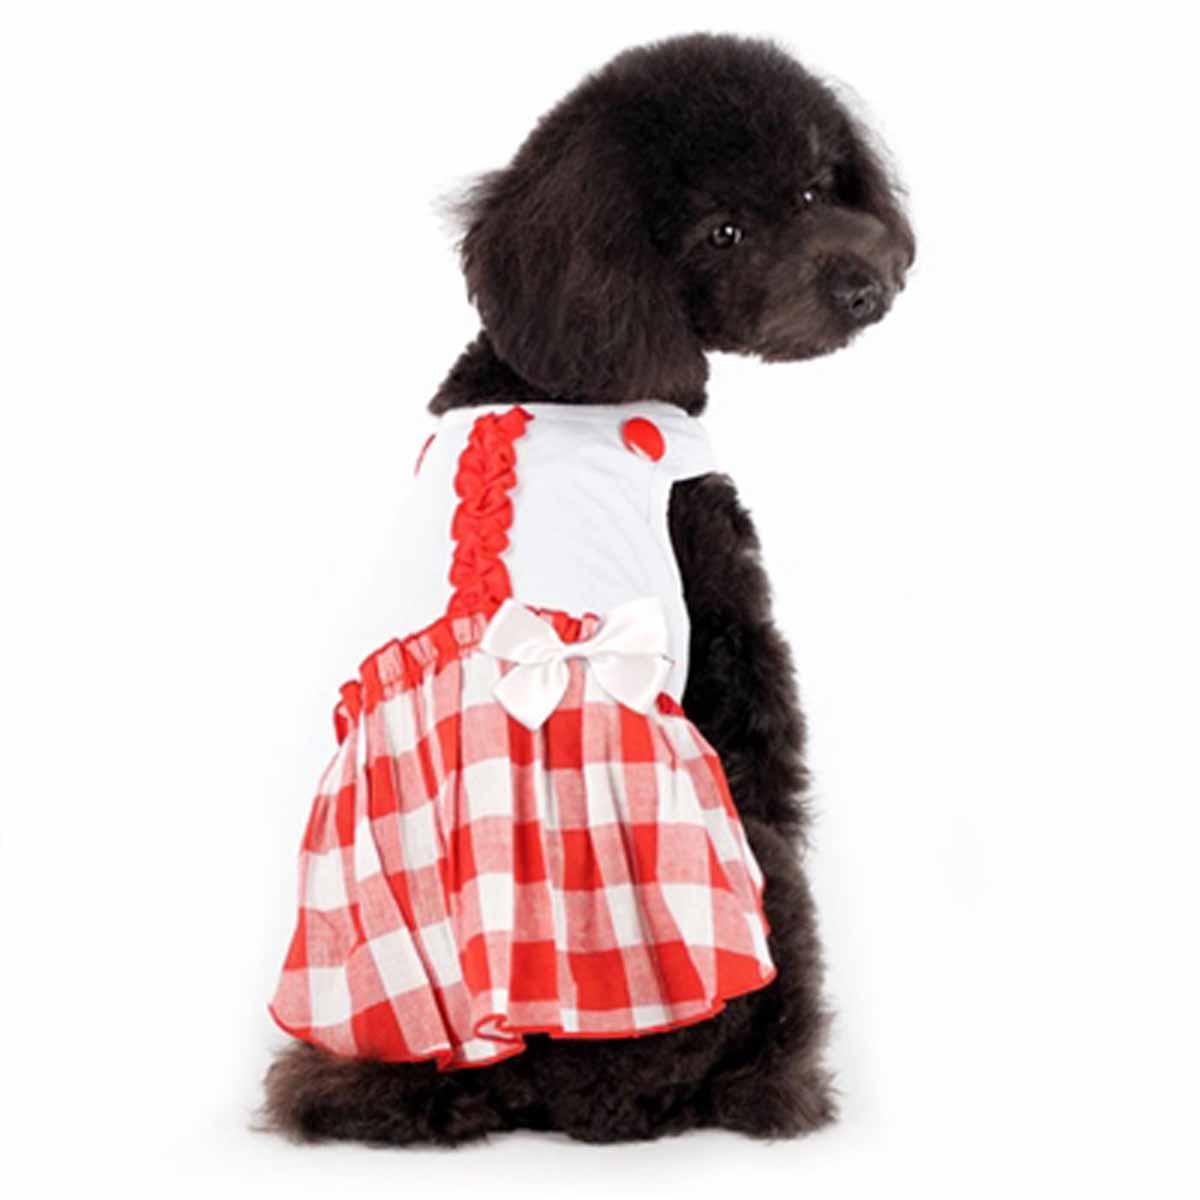 Hippie Country Plaid Dog Dress by Dogo